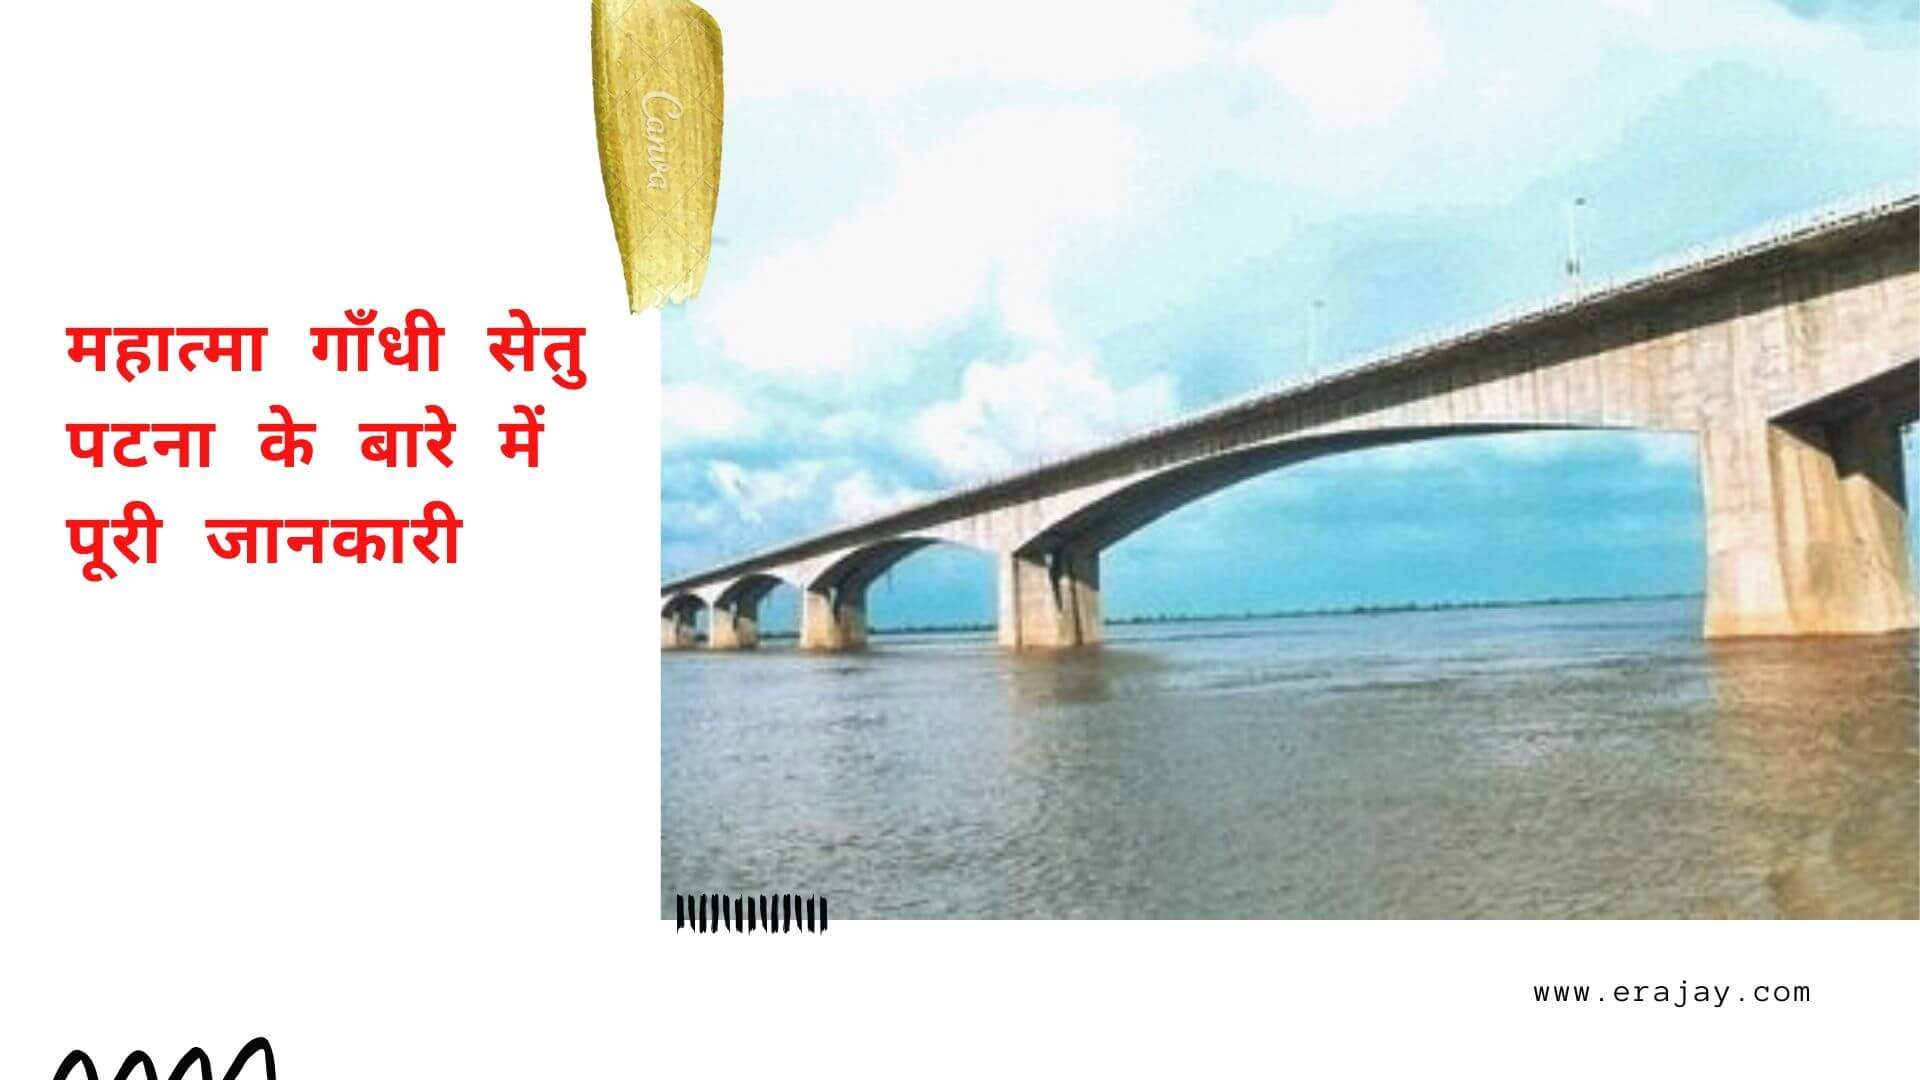 Mahatma gandhi setu full detail in hindi